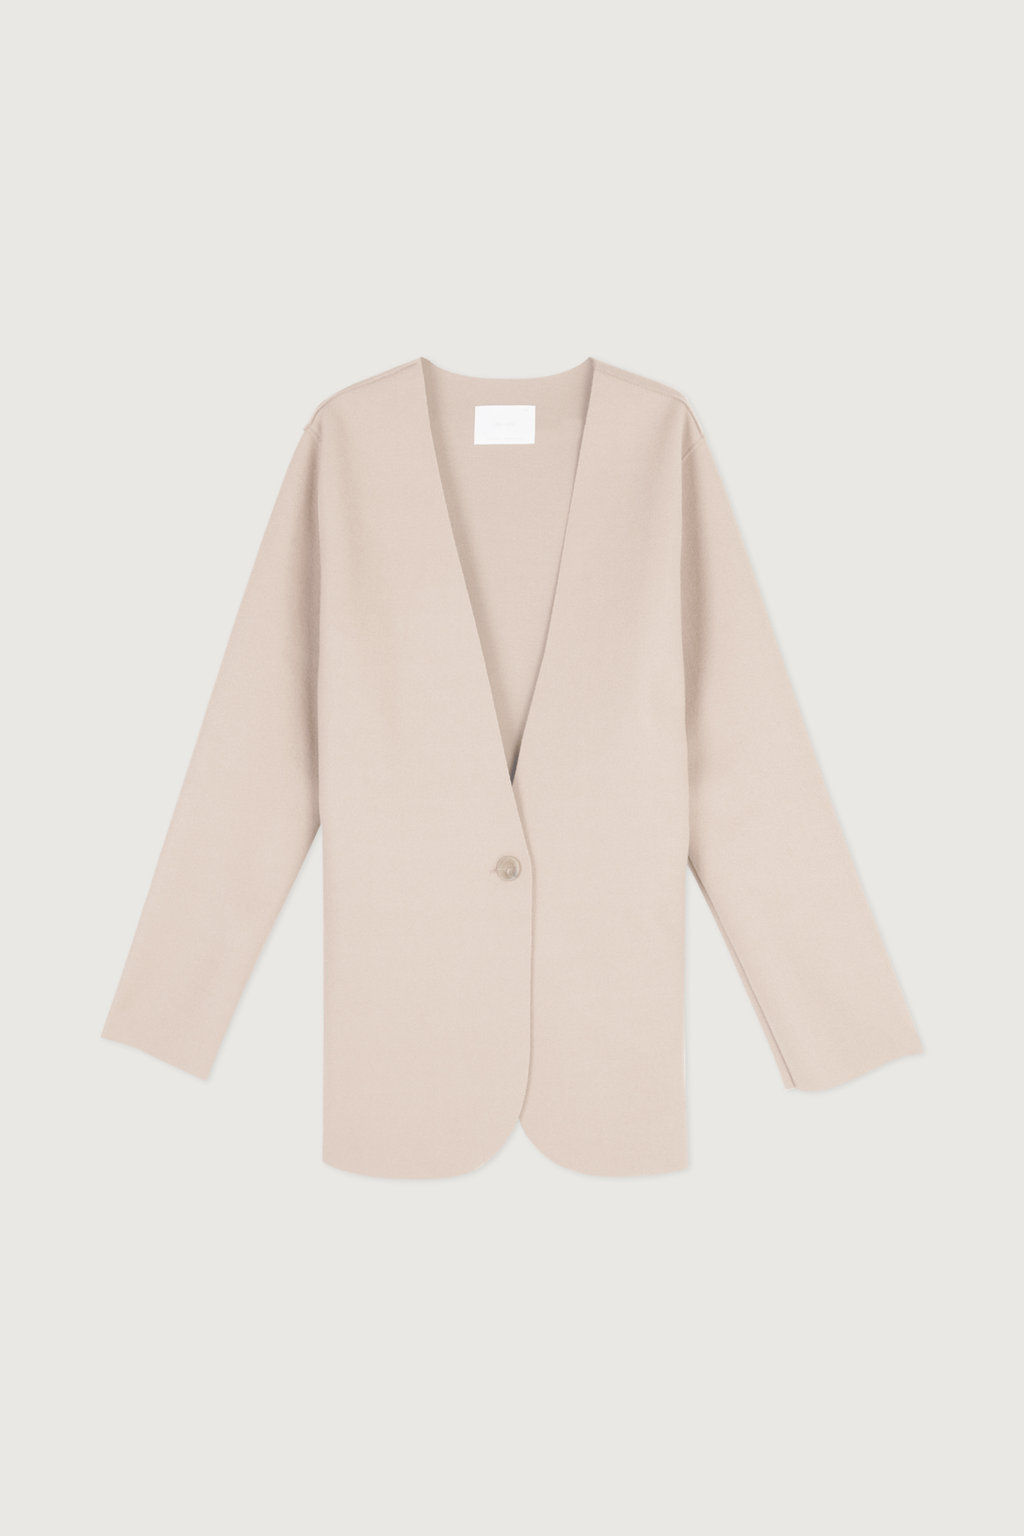 Jacket J009 Cream 5